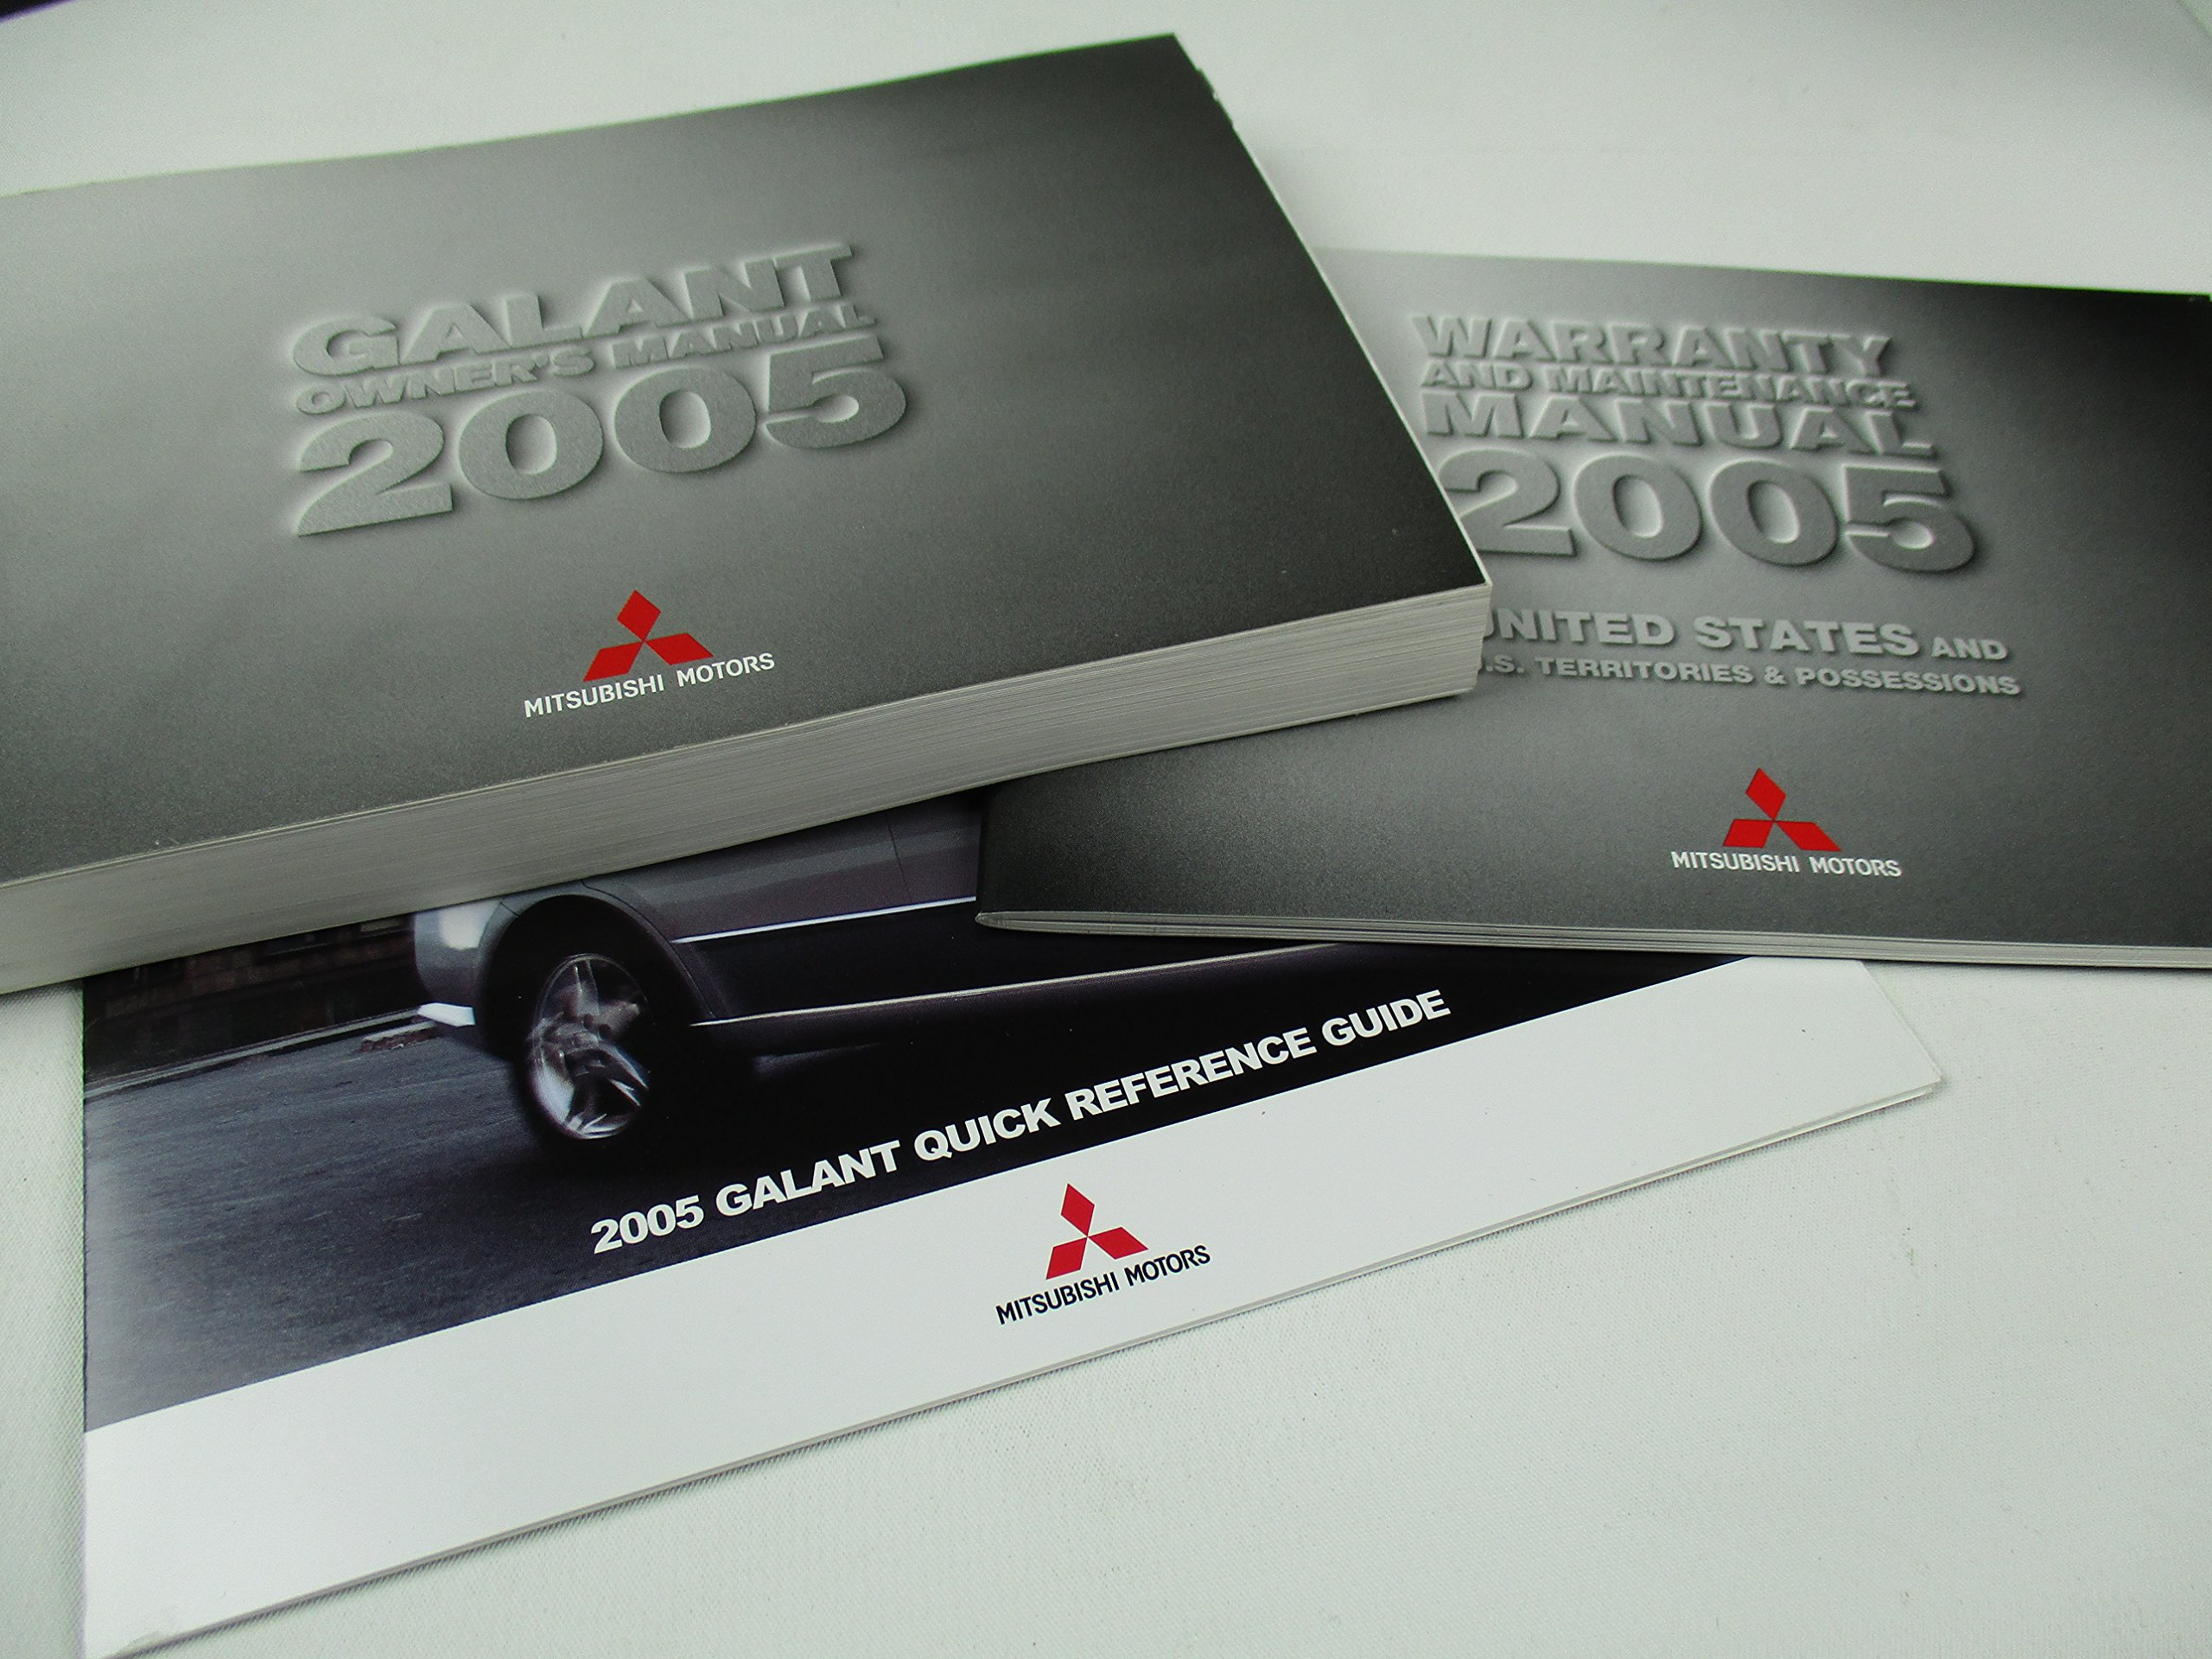 2009 Mitsubishi Galant Repair Manual Car Fuse Box Owners Product User Guide Instruction